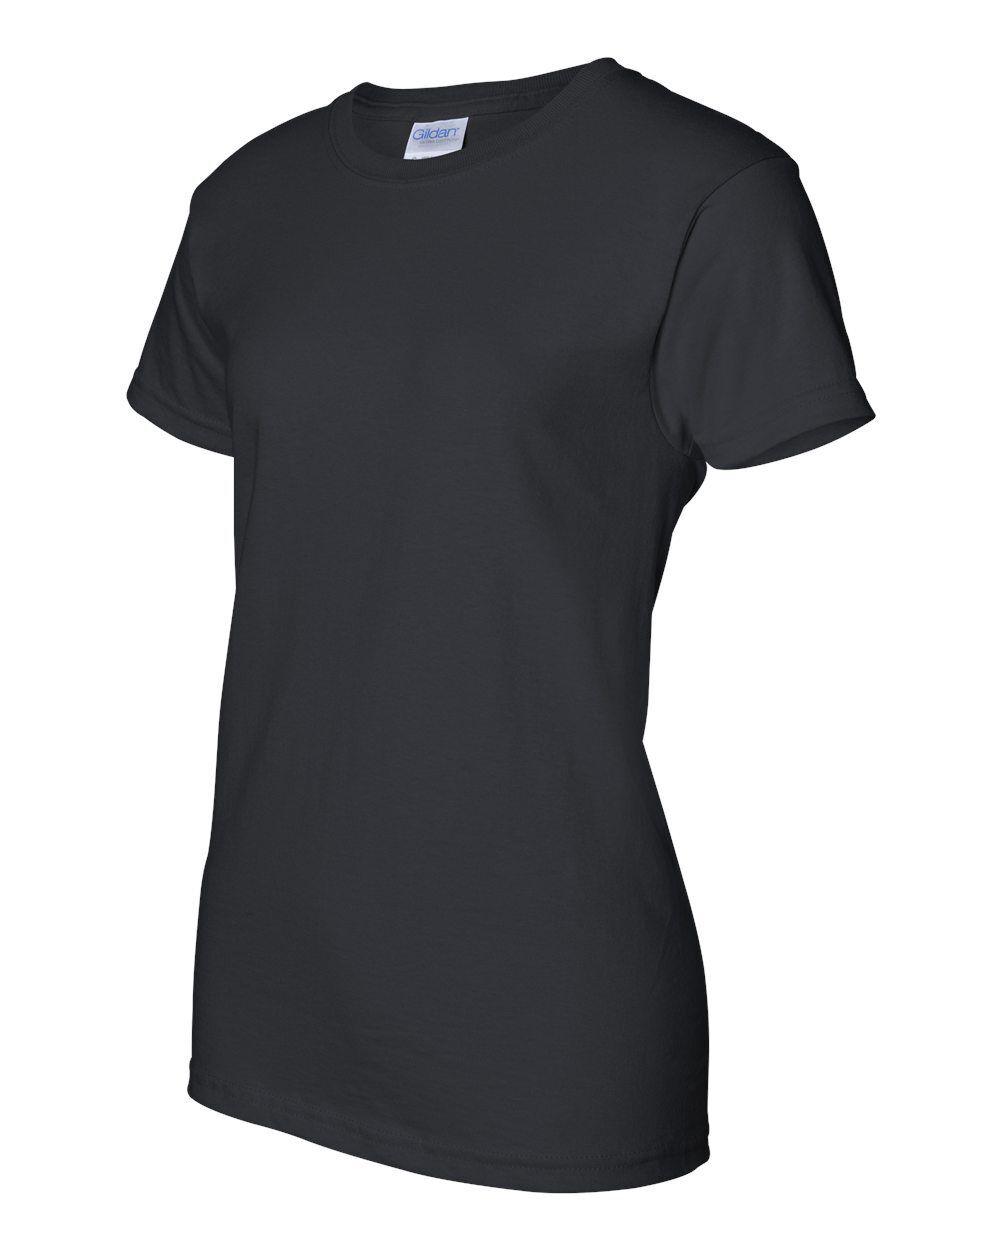 50 Gildan Ladies Ultra Cotton schwarz T-Shirt 2000L Bulk Lot ok to mix Größes XS-XL